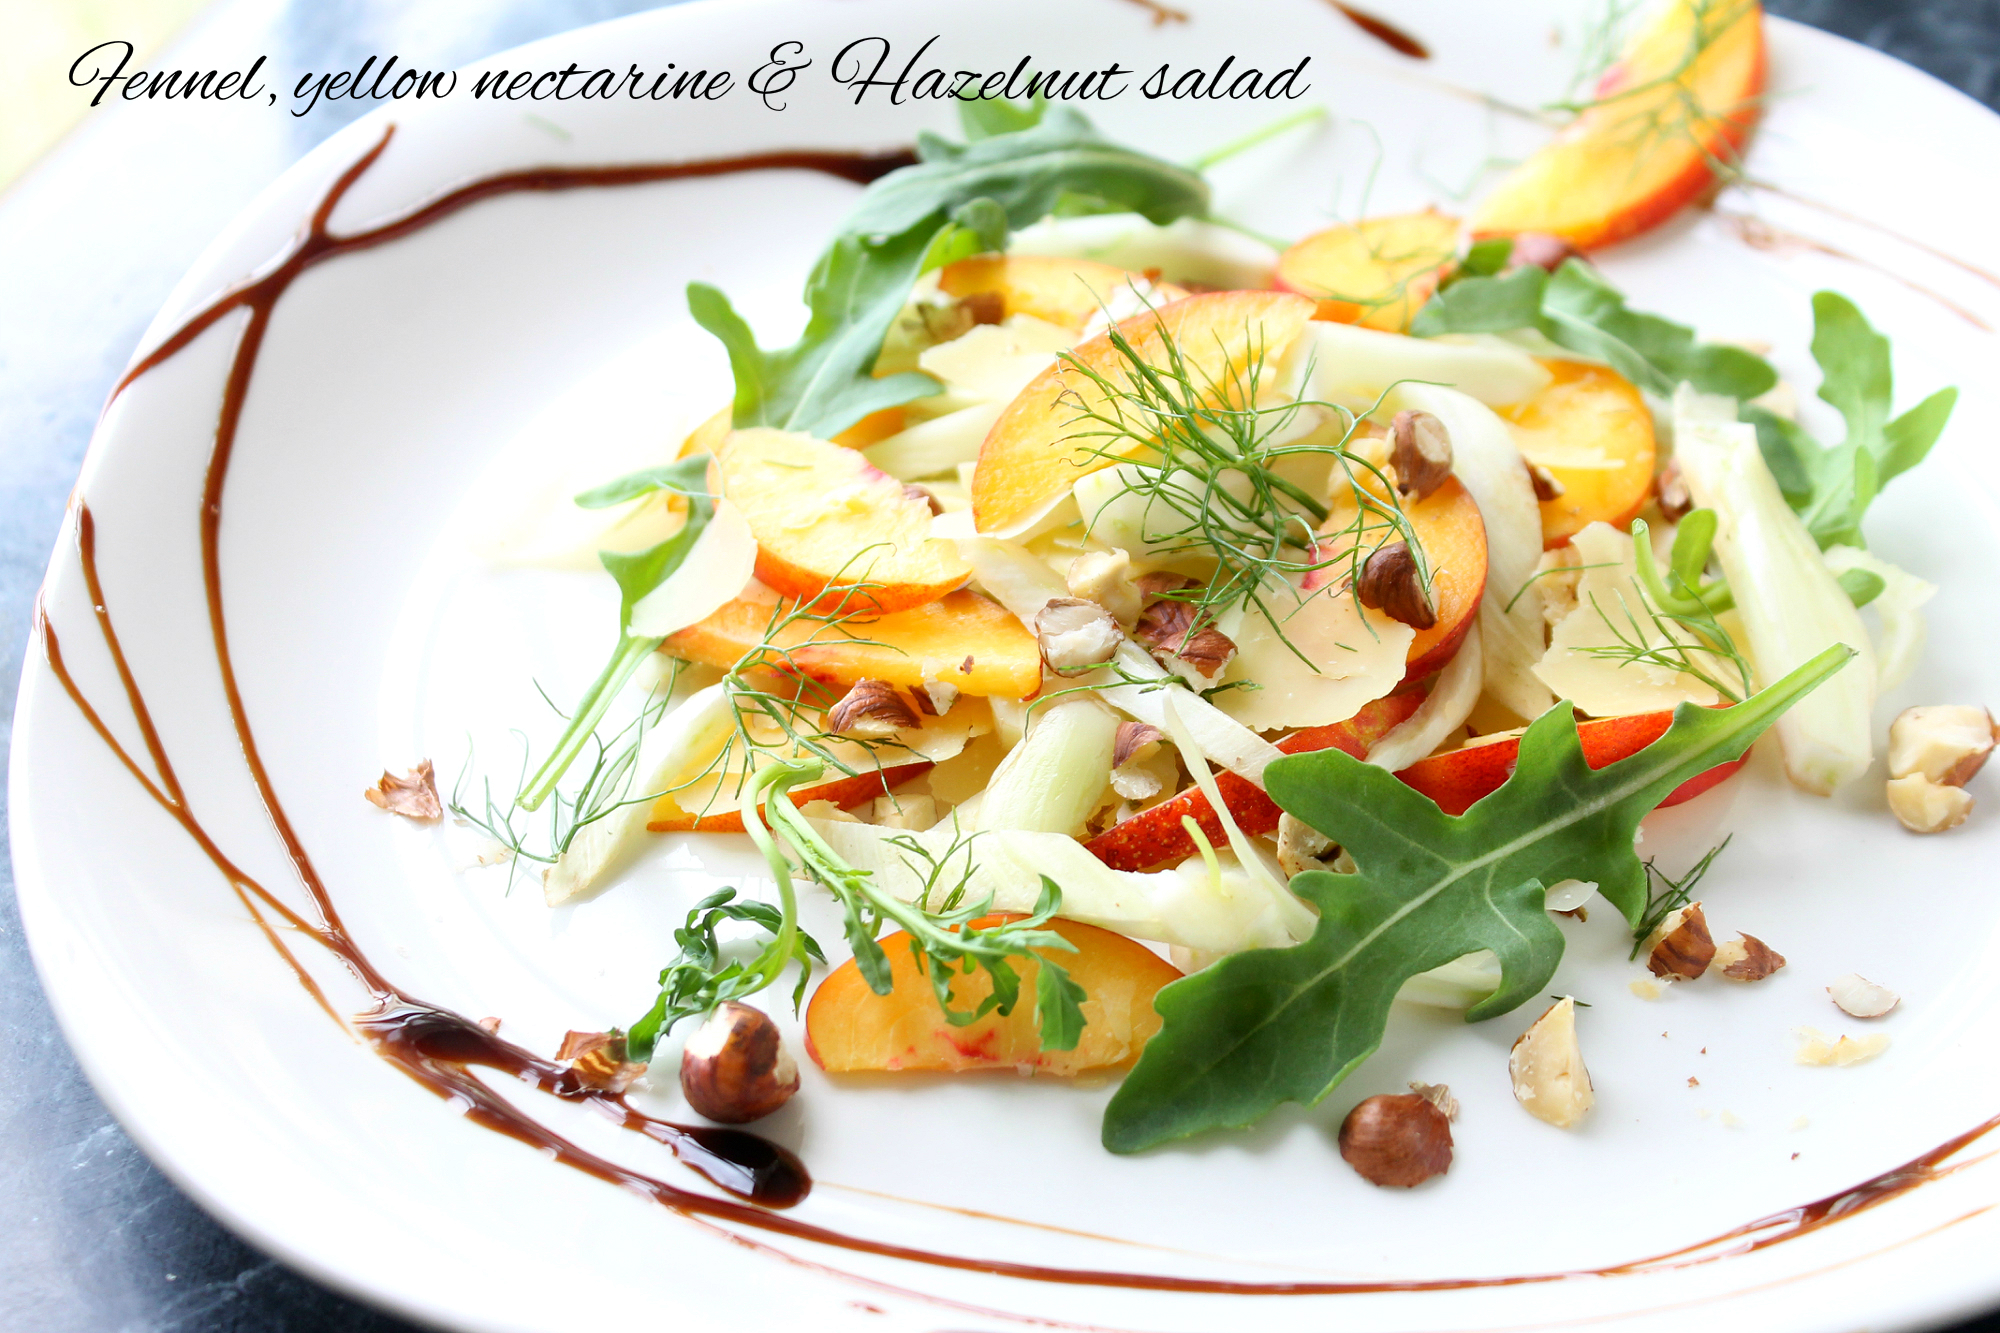 Nectarine, fennel and hazelnut salad